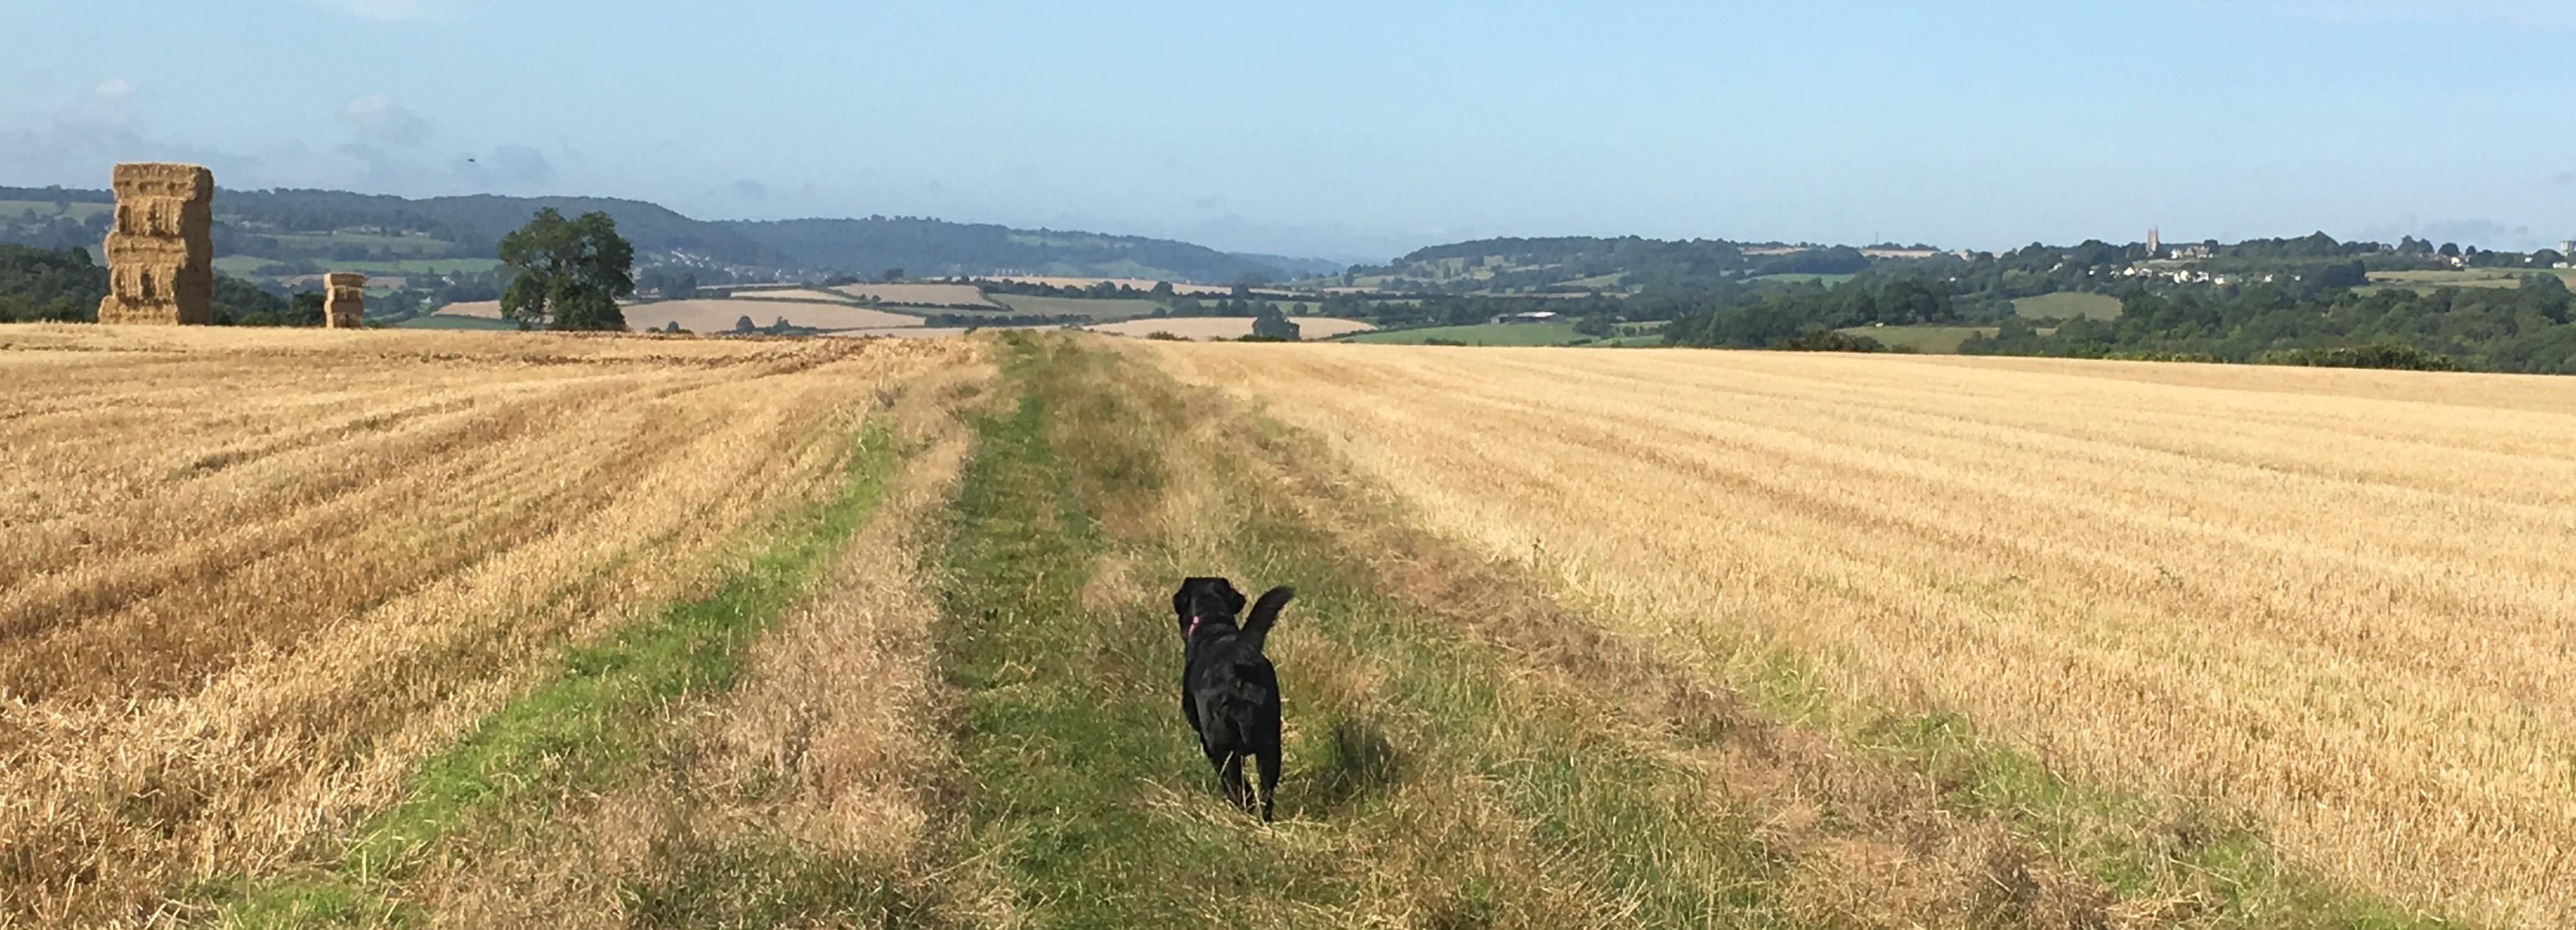 Playful Paws Dog Walks - Chippenham, Wiltshire SN15 2NQ - 07745 344850 | ShowMeLocal.com